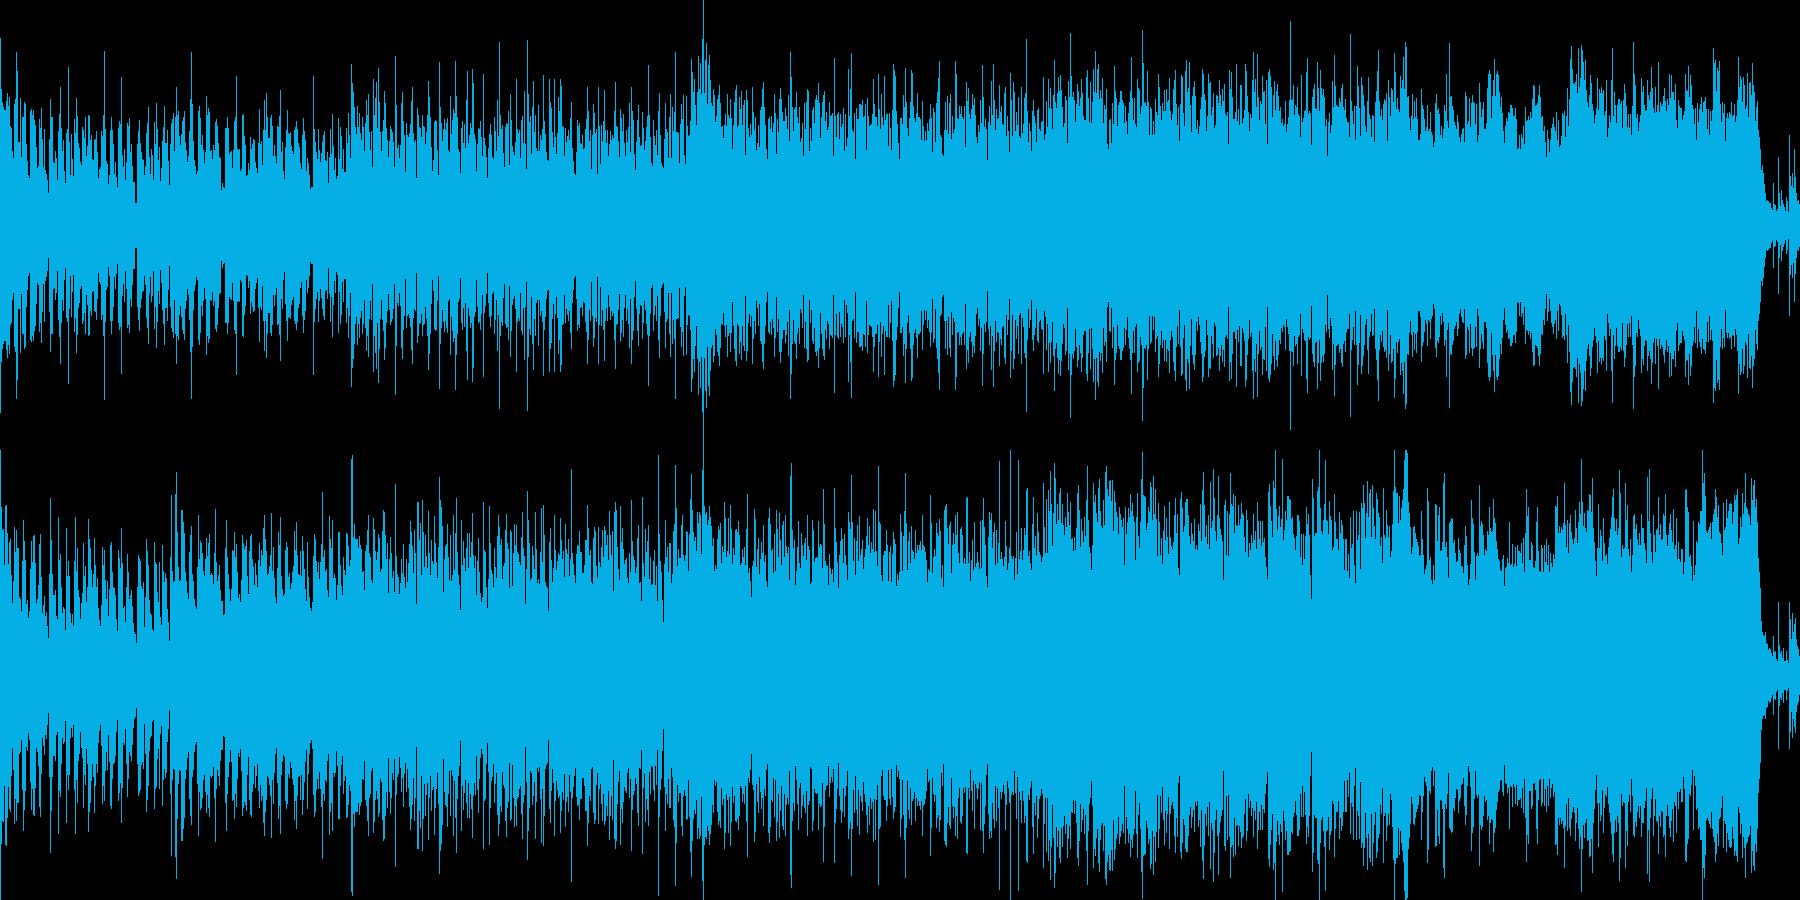 RPGゲーム向けBGM【街】ループ可の再生済みの波形